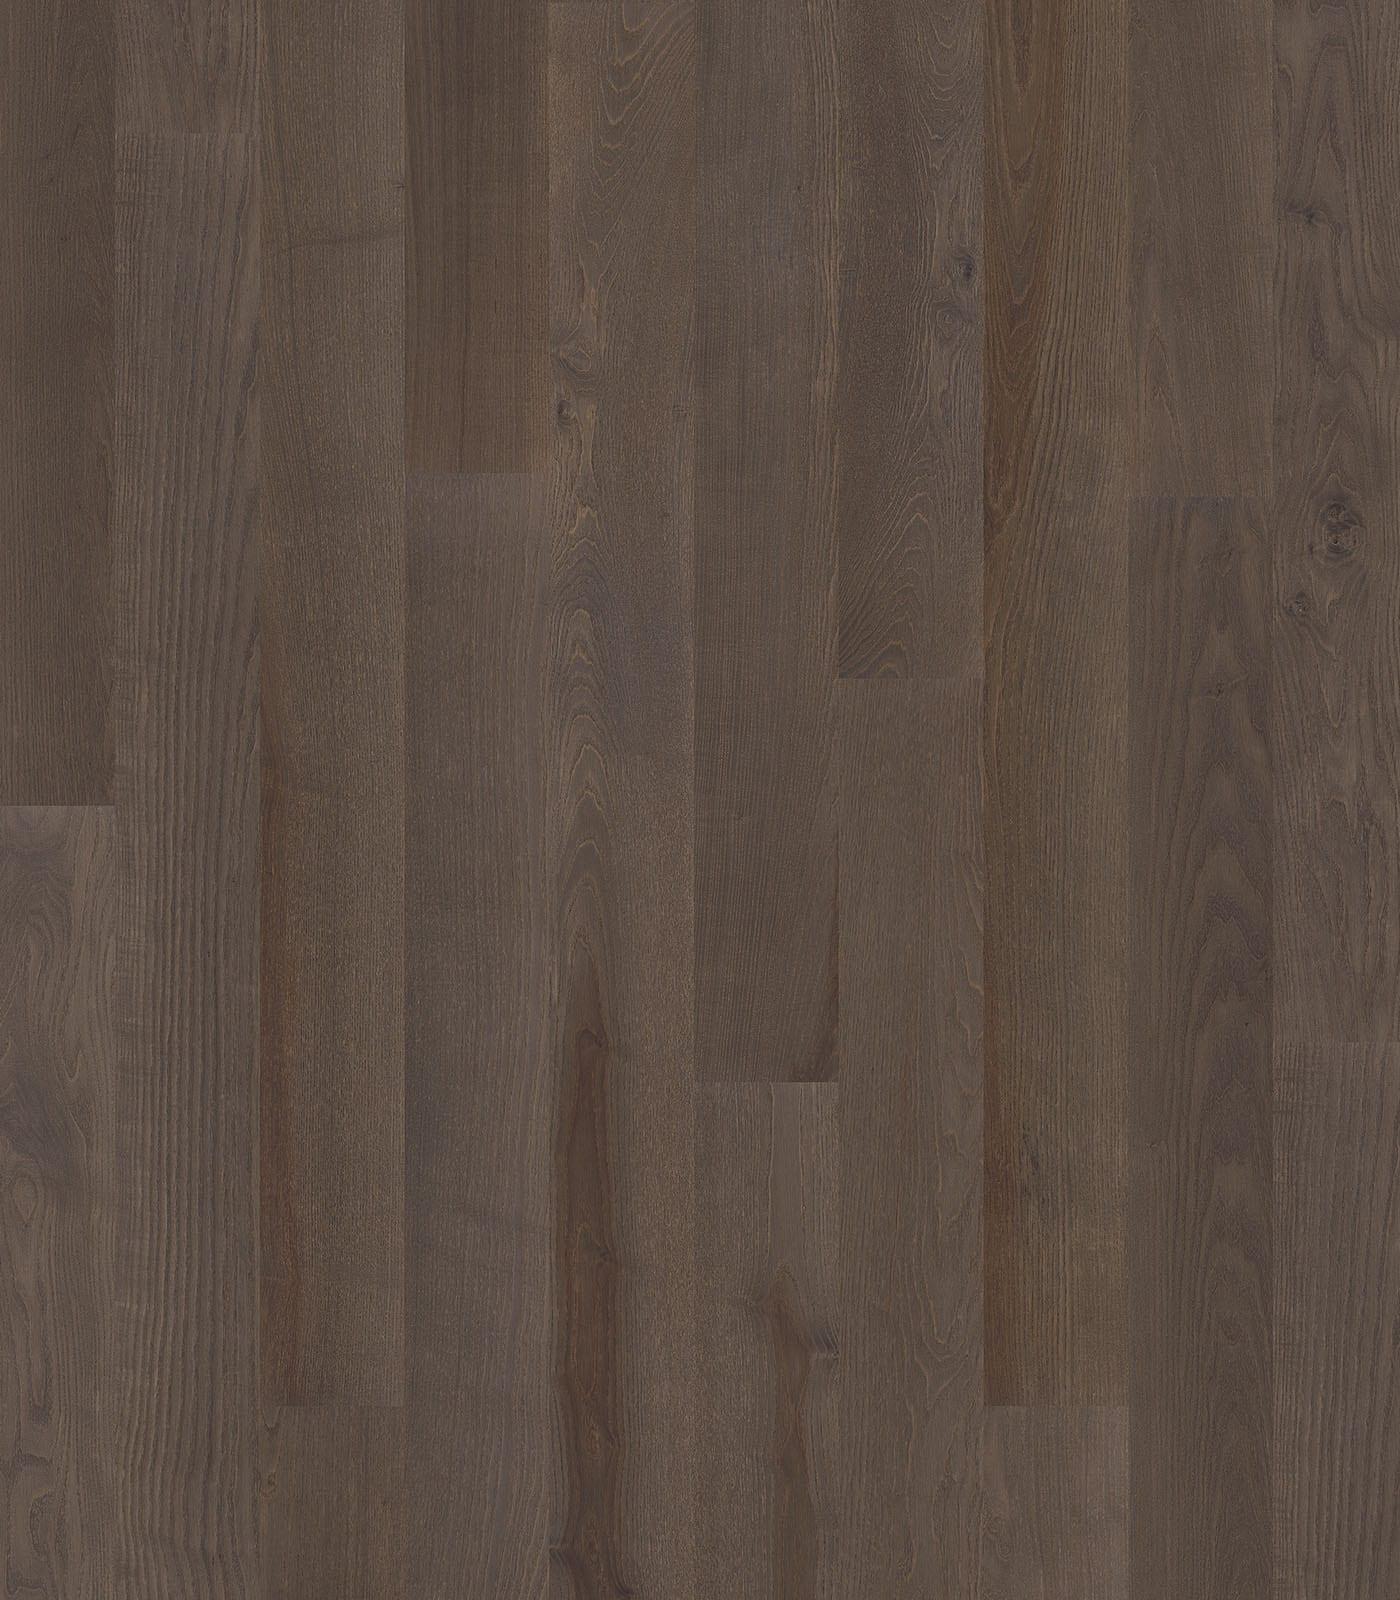 Zagreb-Antique collection-European Oak floors - Flat